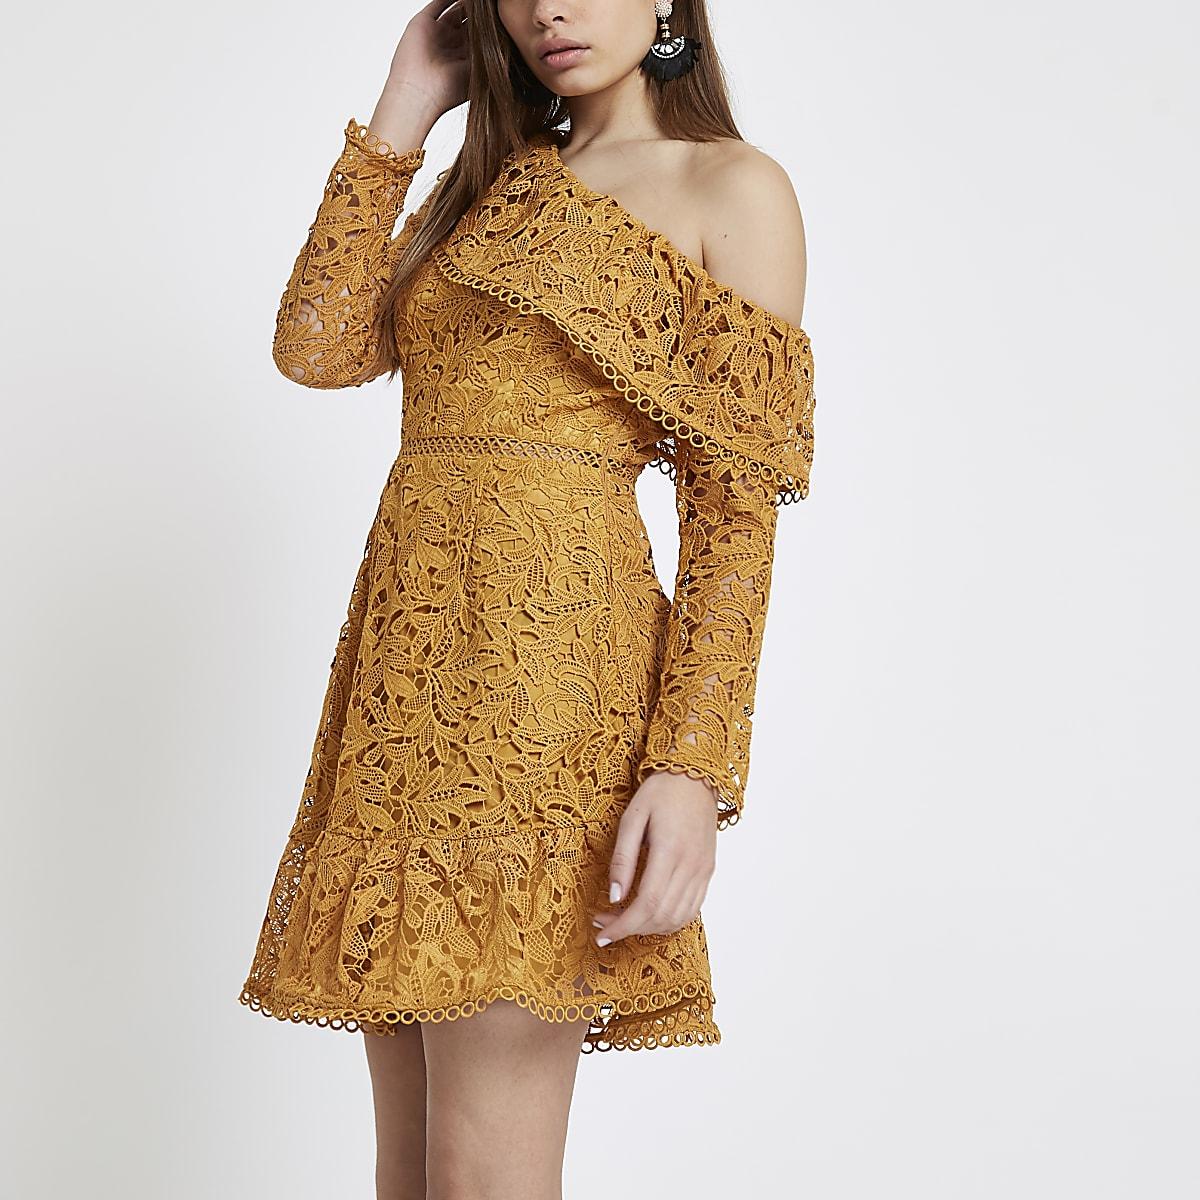 93260fbf0b0 Mustard lace one shoulder frill dress - Skater Dresses - Dresses - women